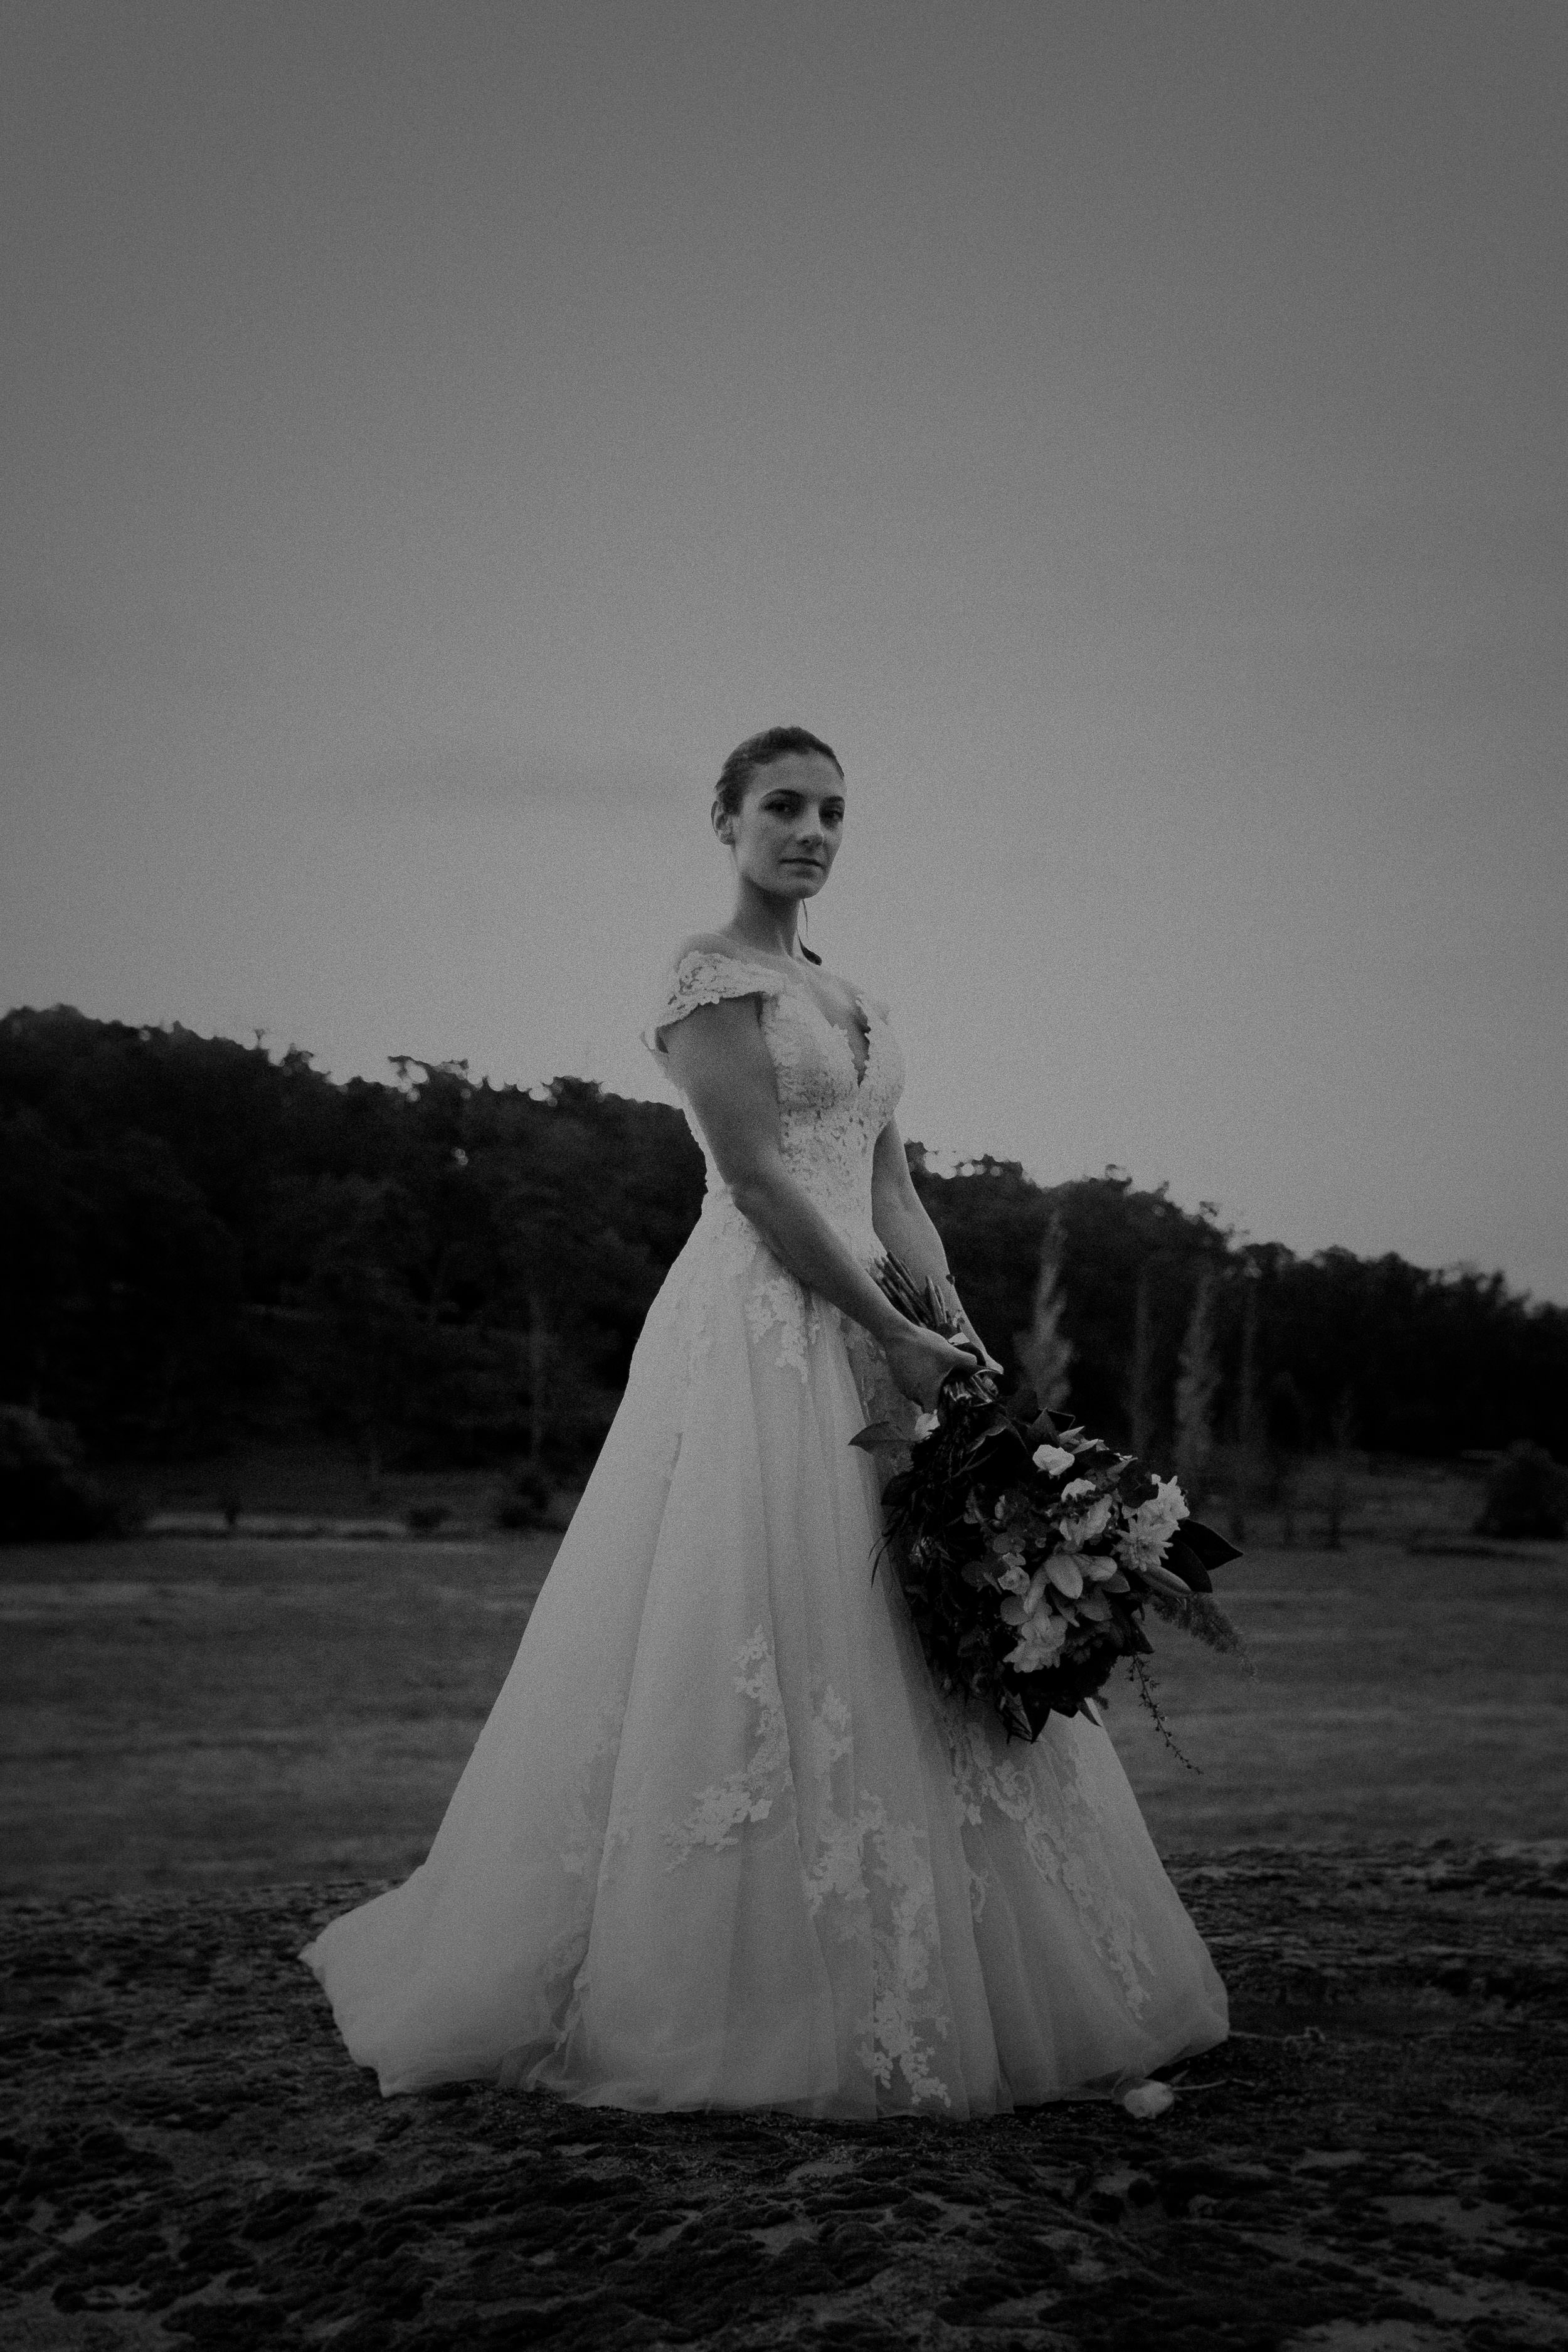 g_c wedding - kings _ thieves elopement wedding photography - blog 96.jpg